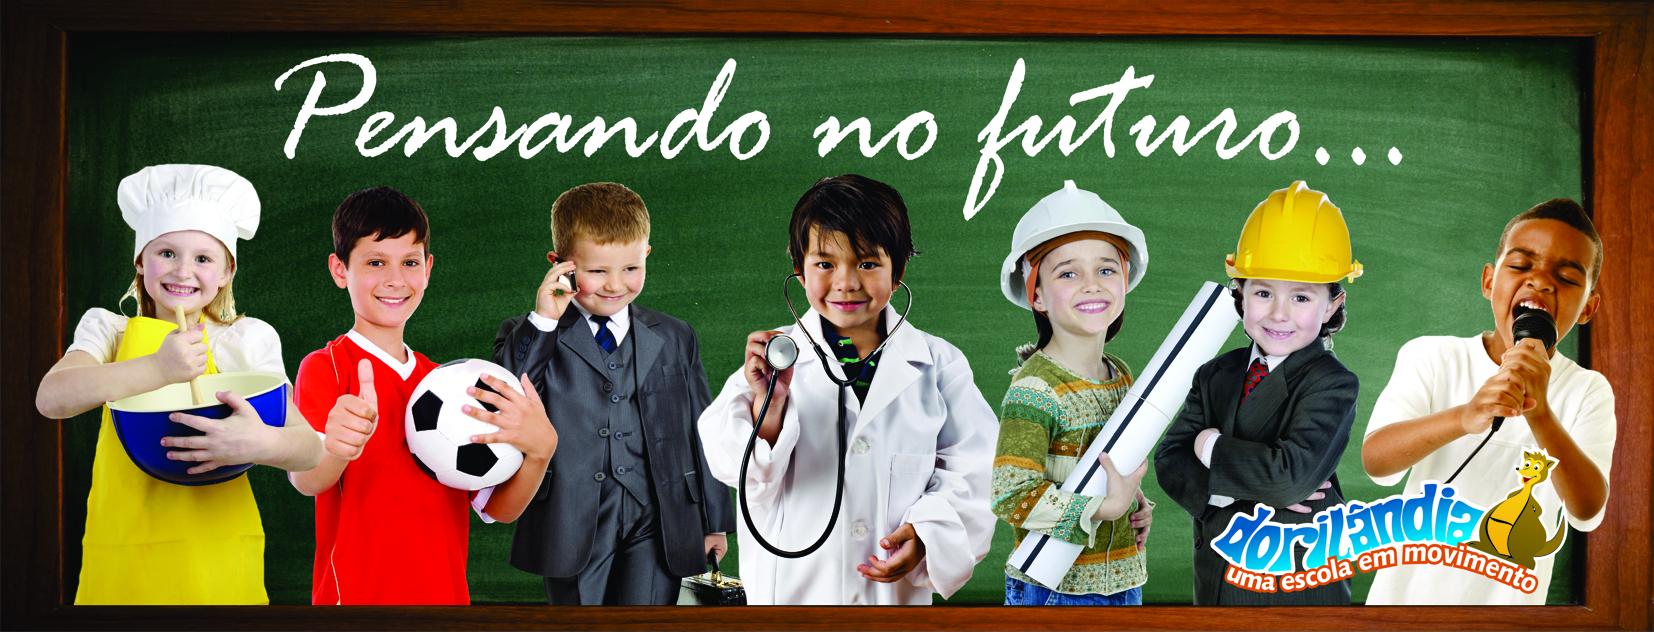 Banner - Escola Dorilândia